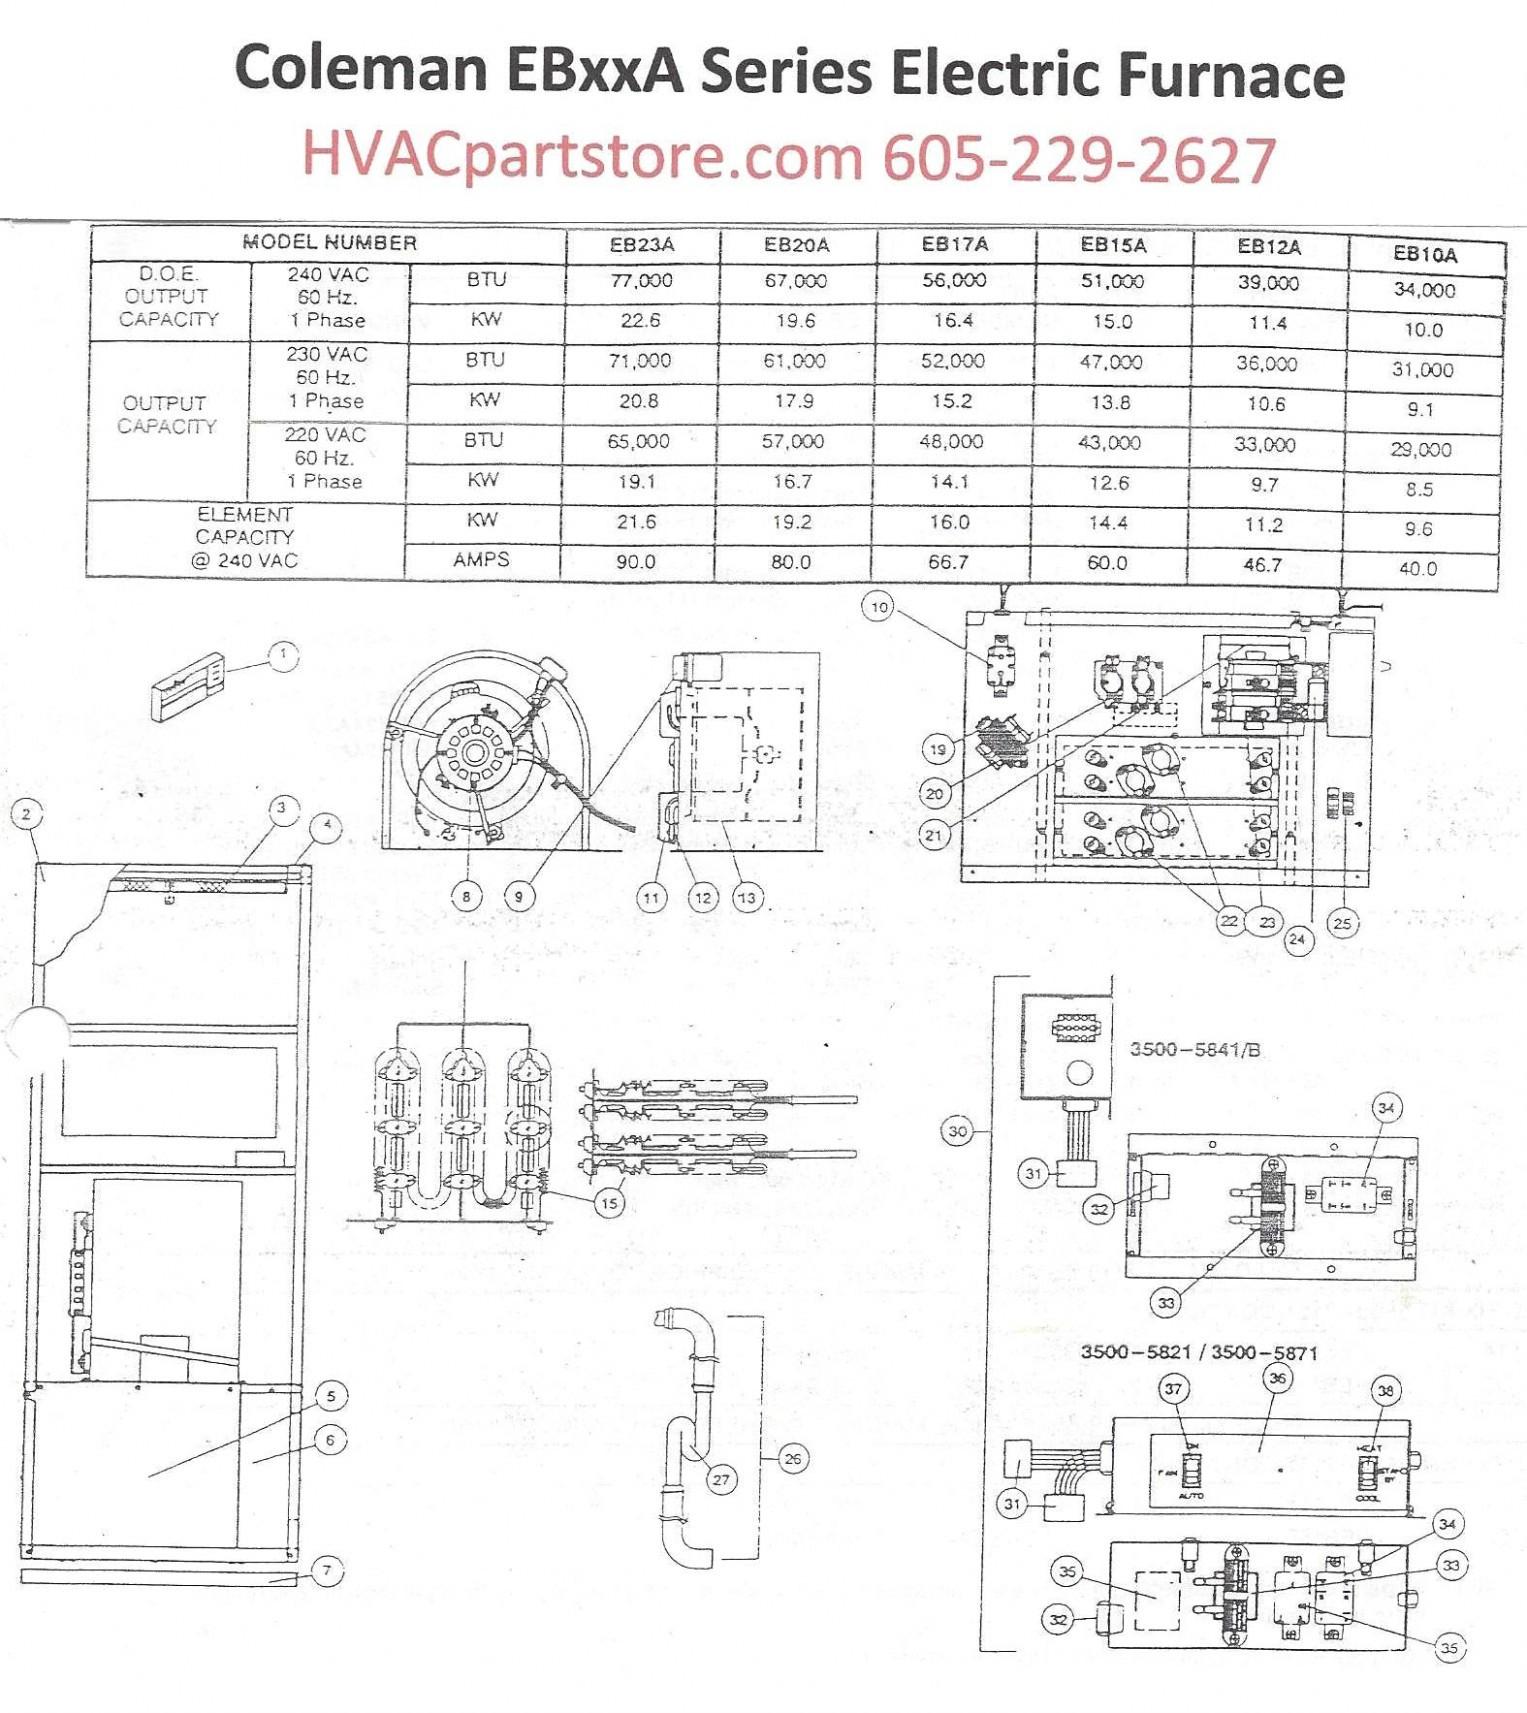 10 Kw Electric Furnace Wiring Diagram | Wiring Library - Coleman Mobile Home Electric Furnace Wiring Diagram